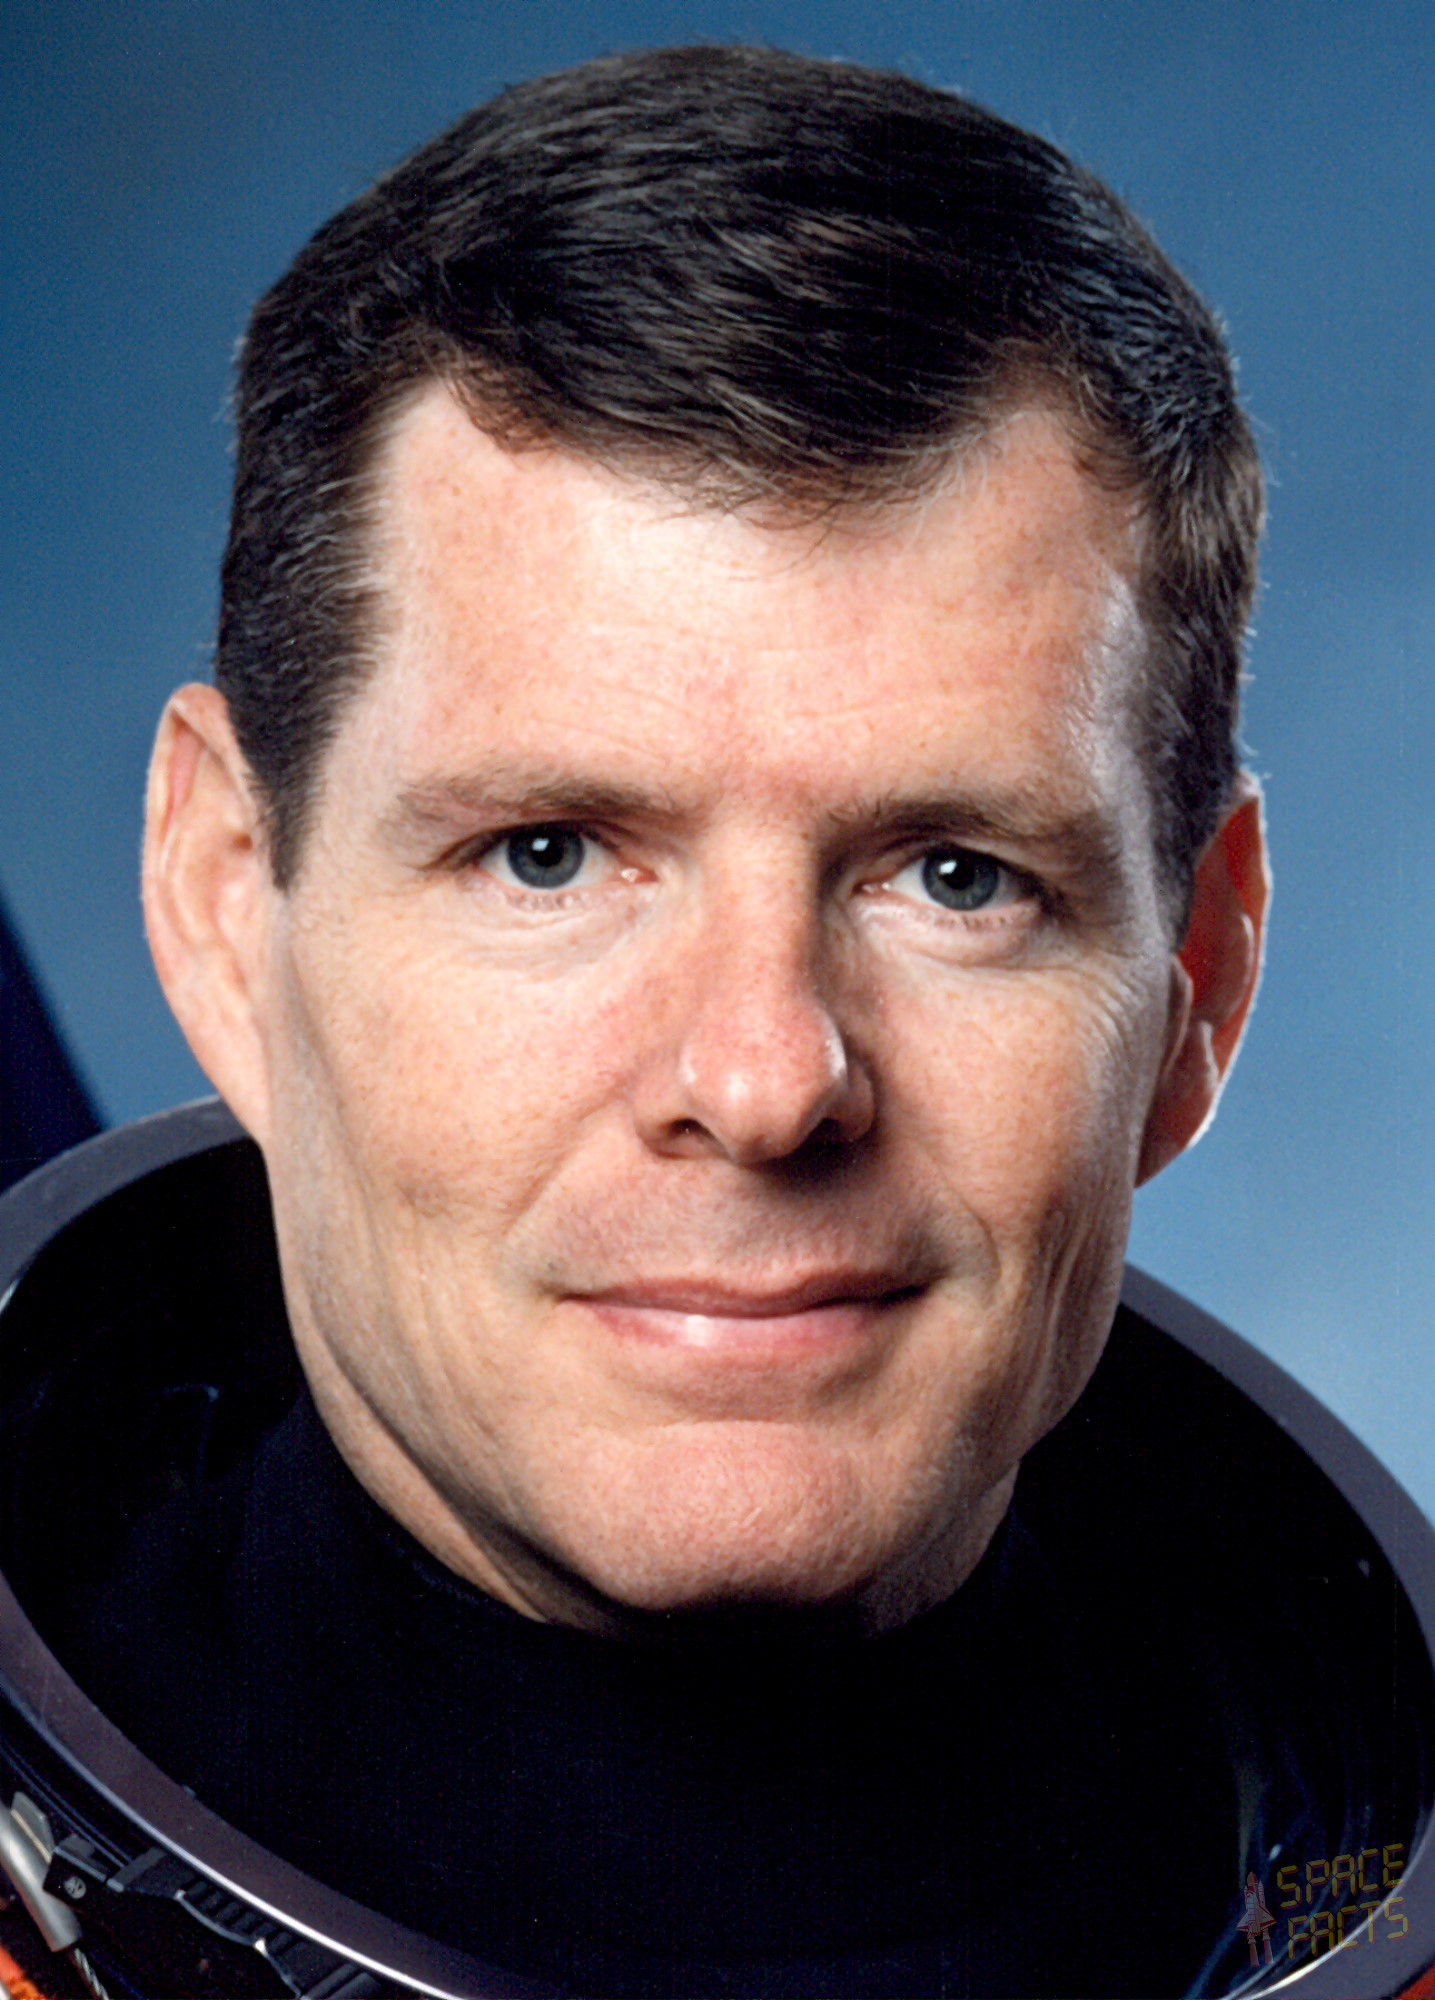 Astronaut Biography: Bryan O'Connor